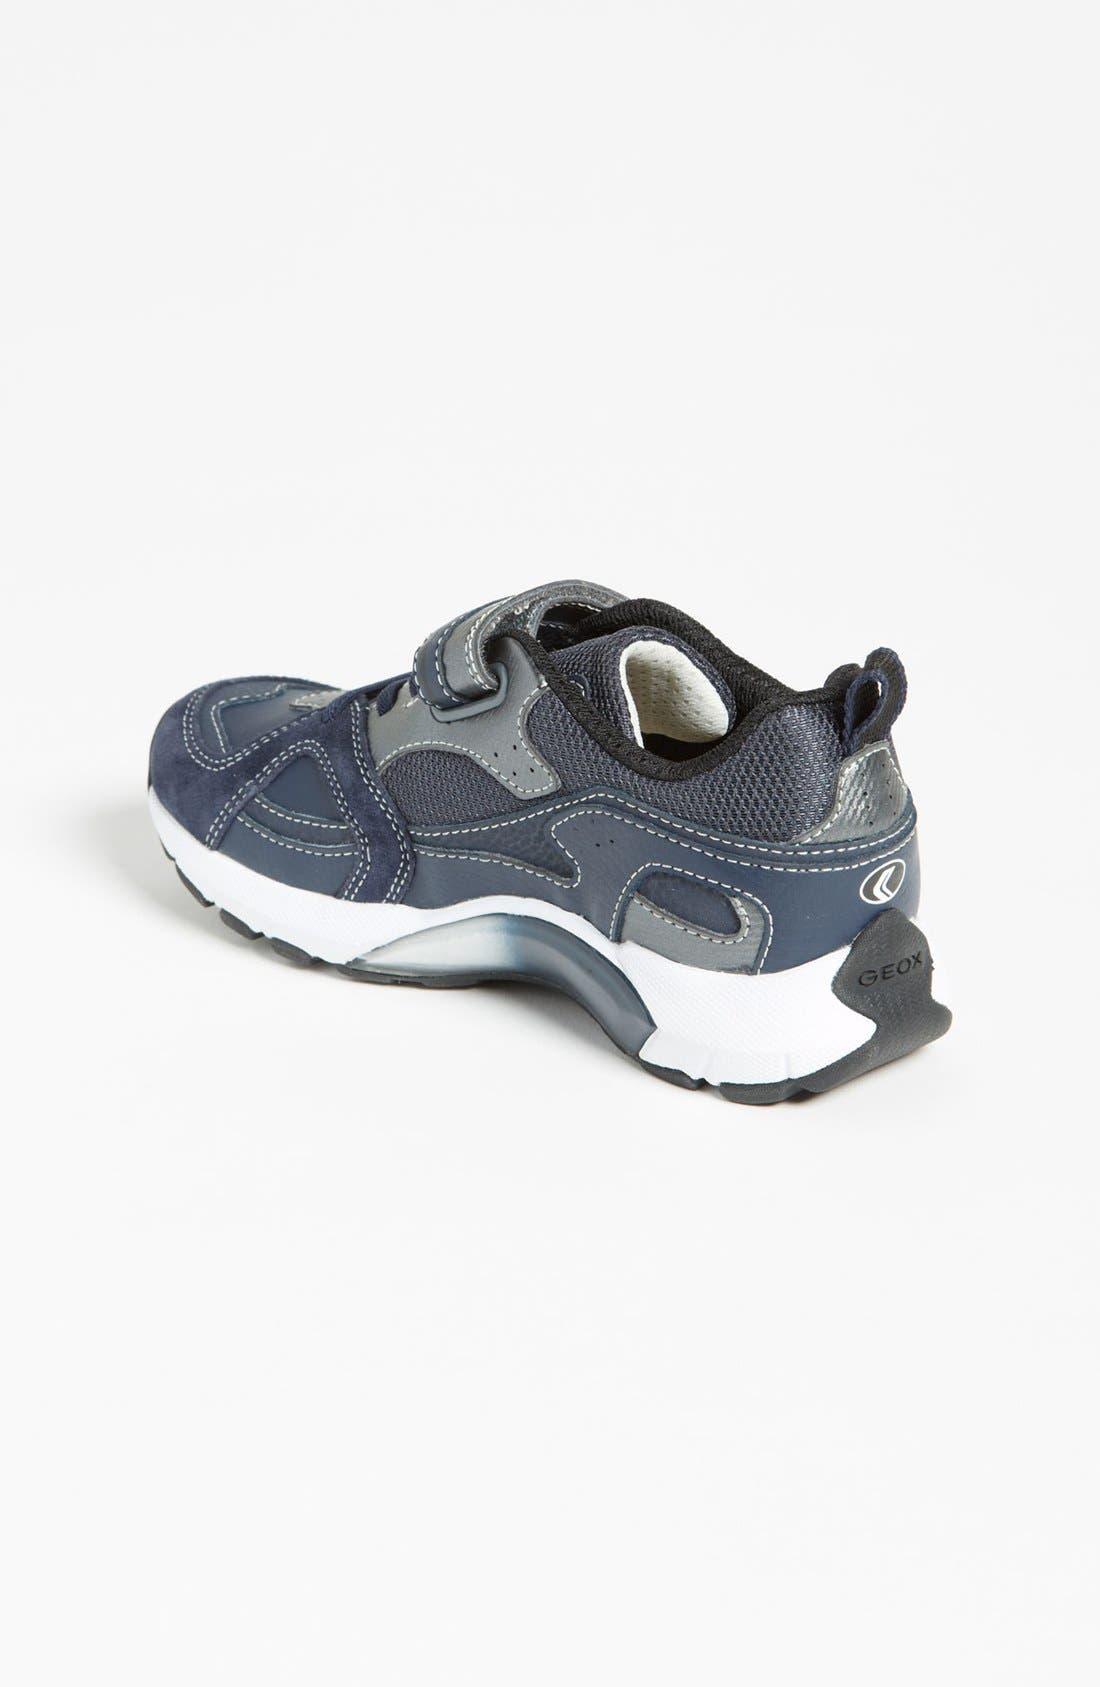 Alternate Image 2  - Geox 'Stark 8' Sneaker (Toddler, Little Kid & Big Kid)